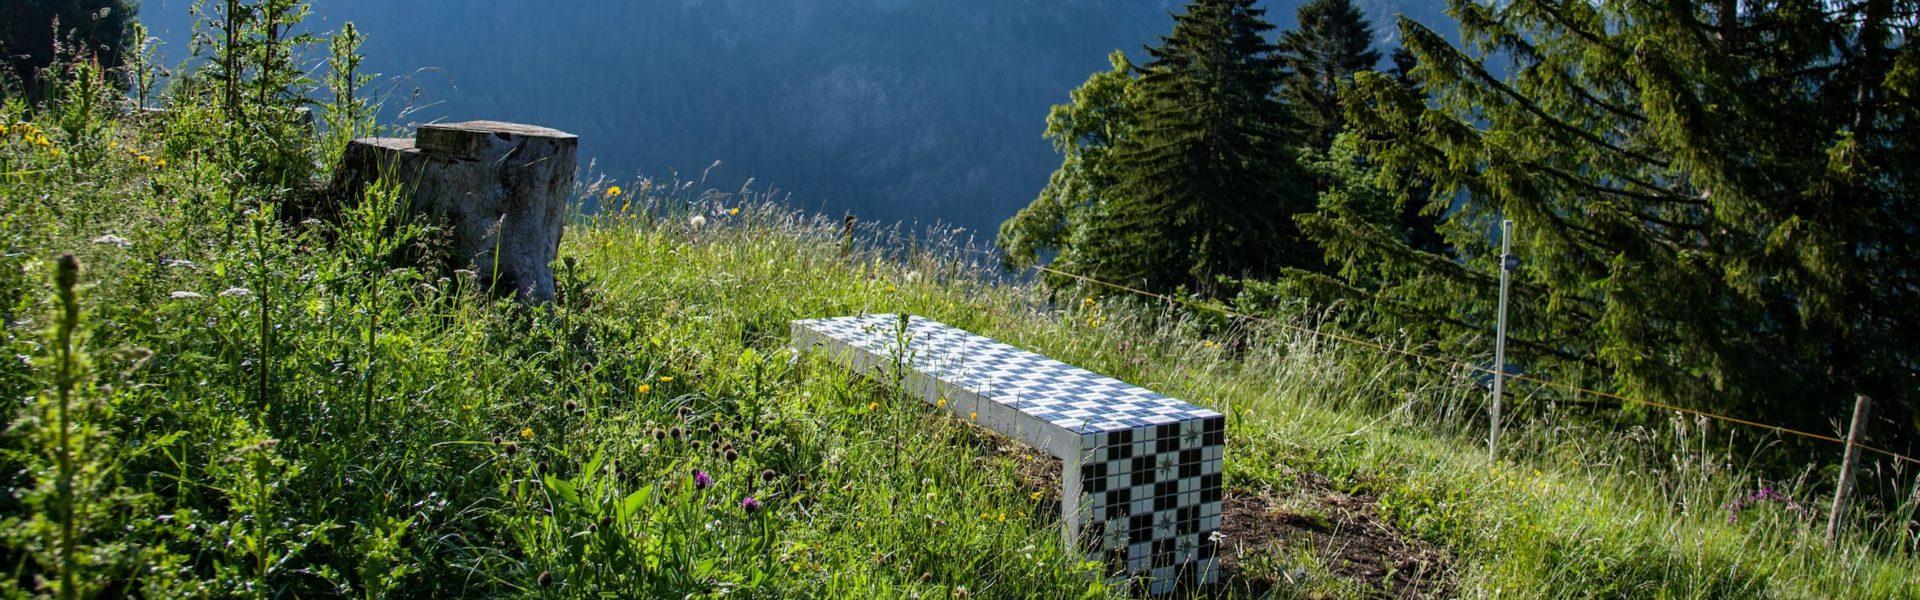 Alpine Art Muttersberg, Kunstweg, Wandern zur Kultur (c) Oliver Lerch / Foto Lerch